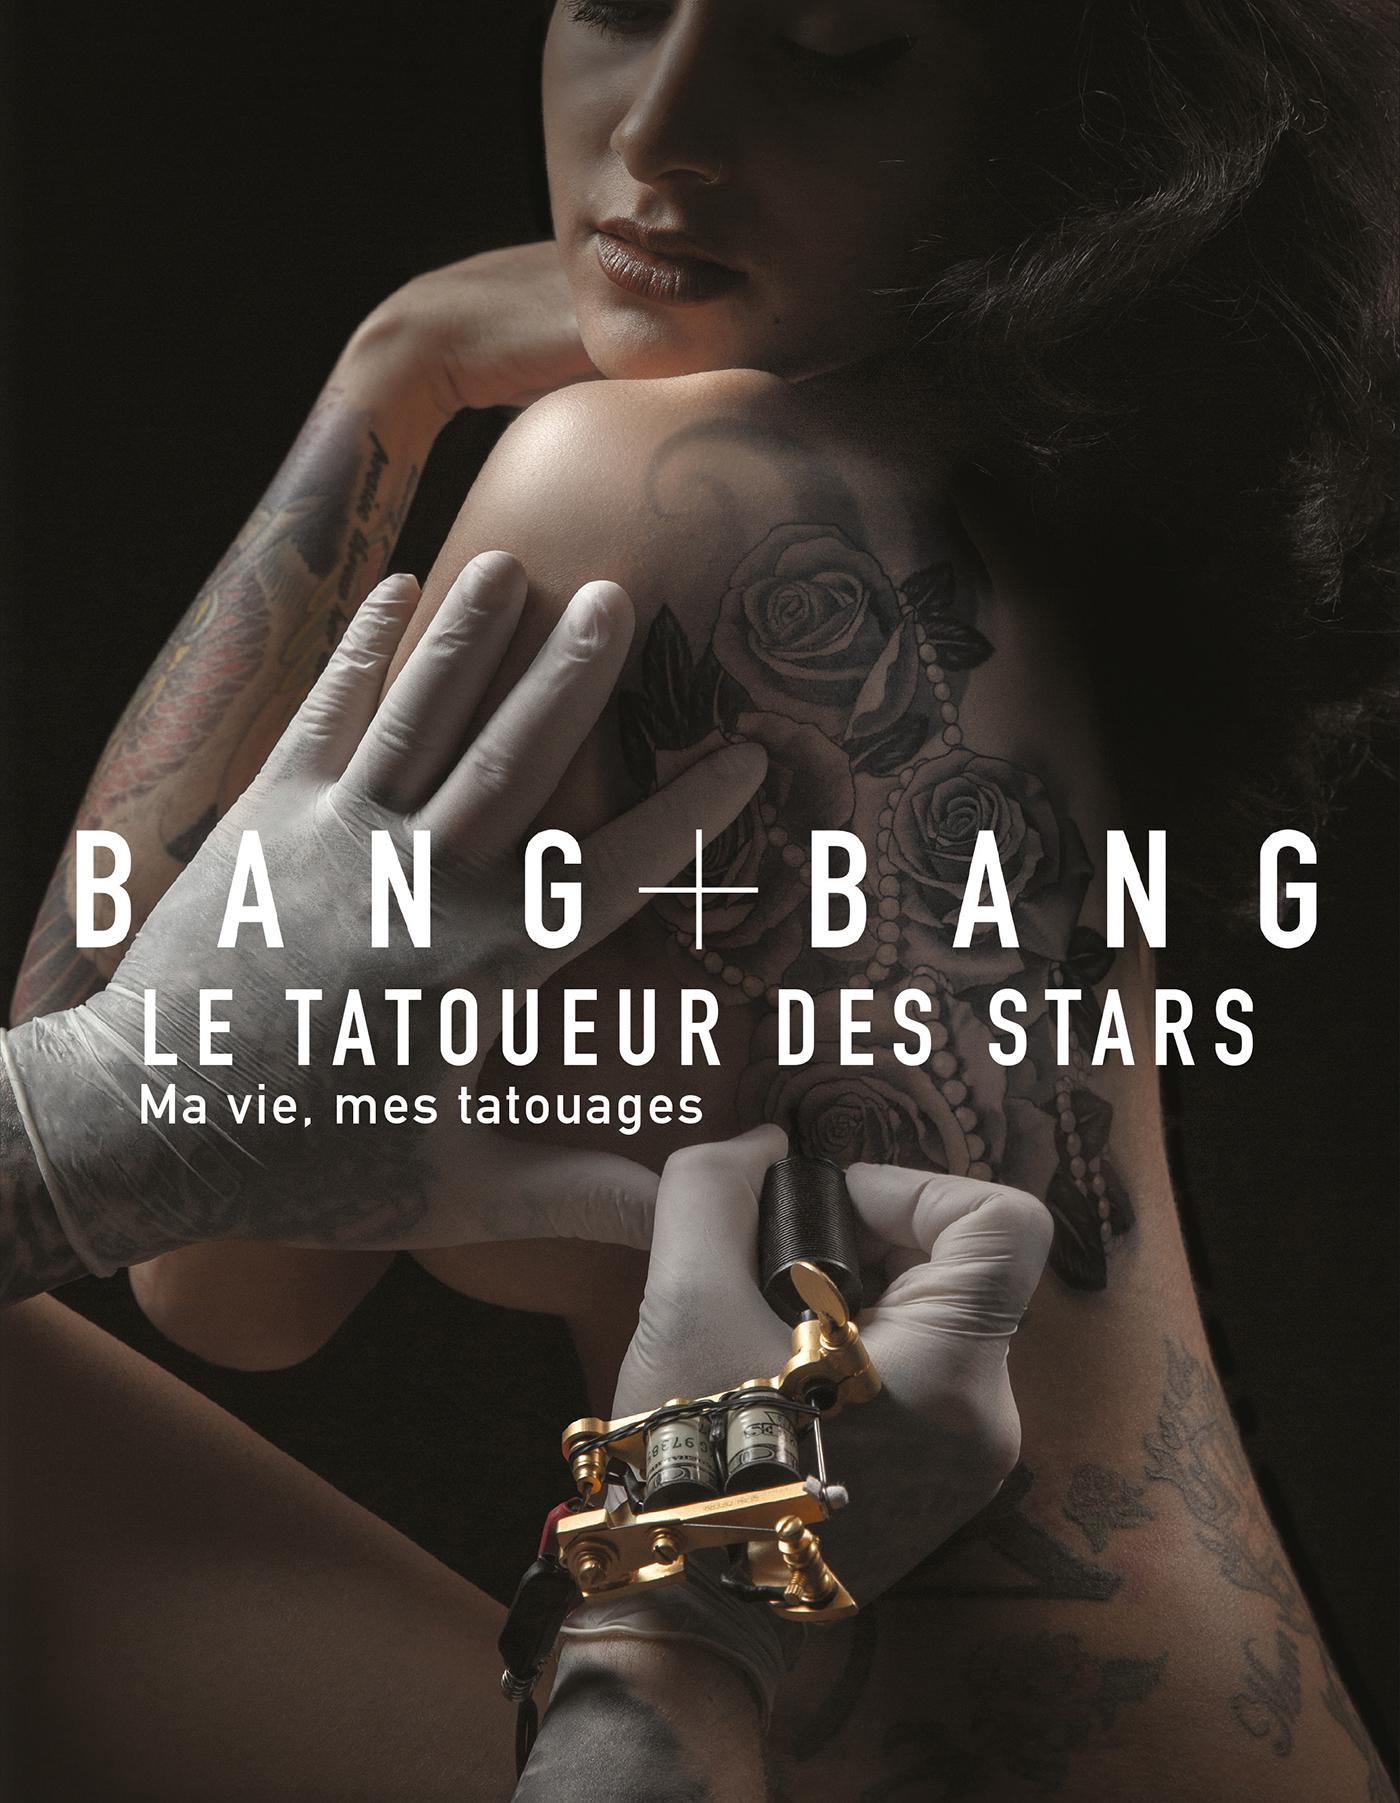 BANG BANG - MA VIE, MES TATOUAGES - LE TATOUEUR DES STARS